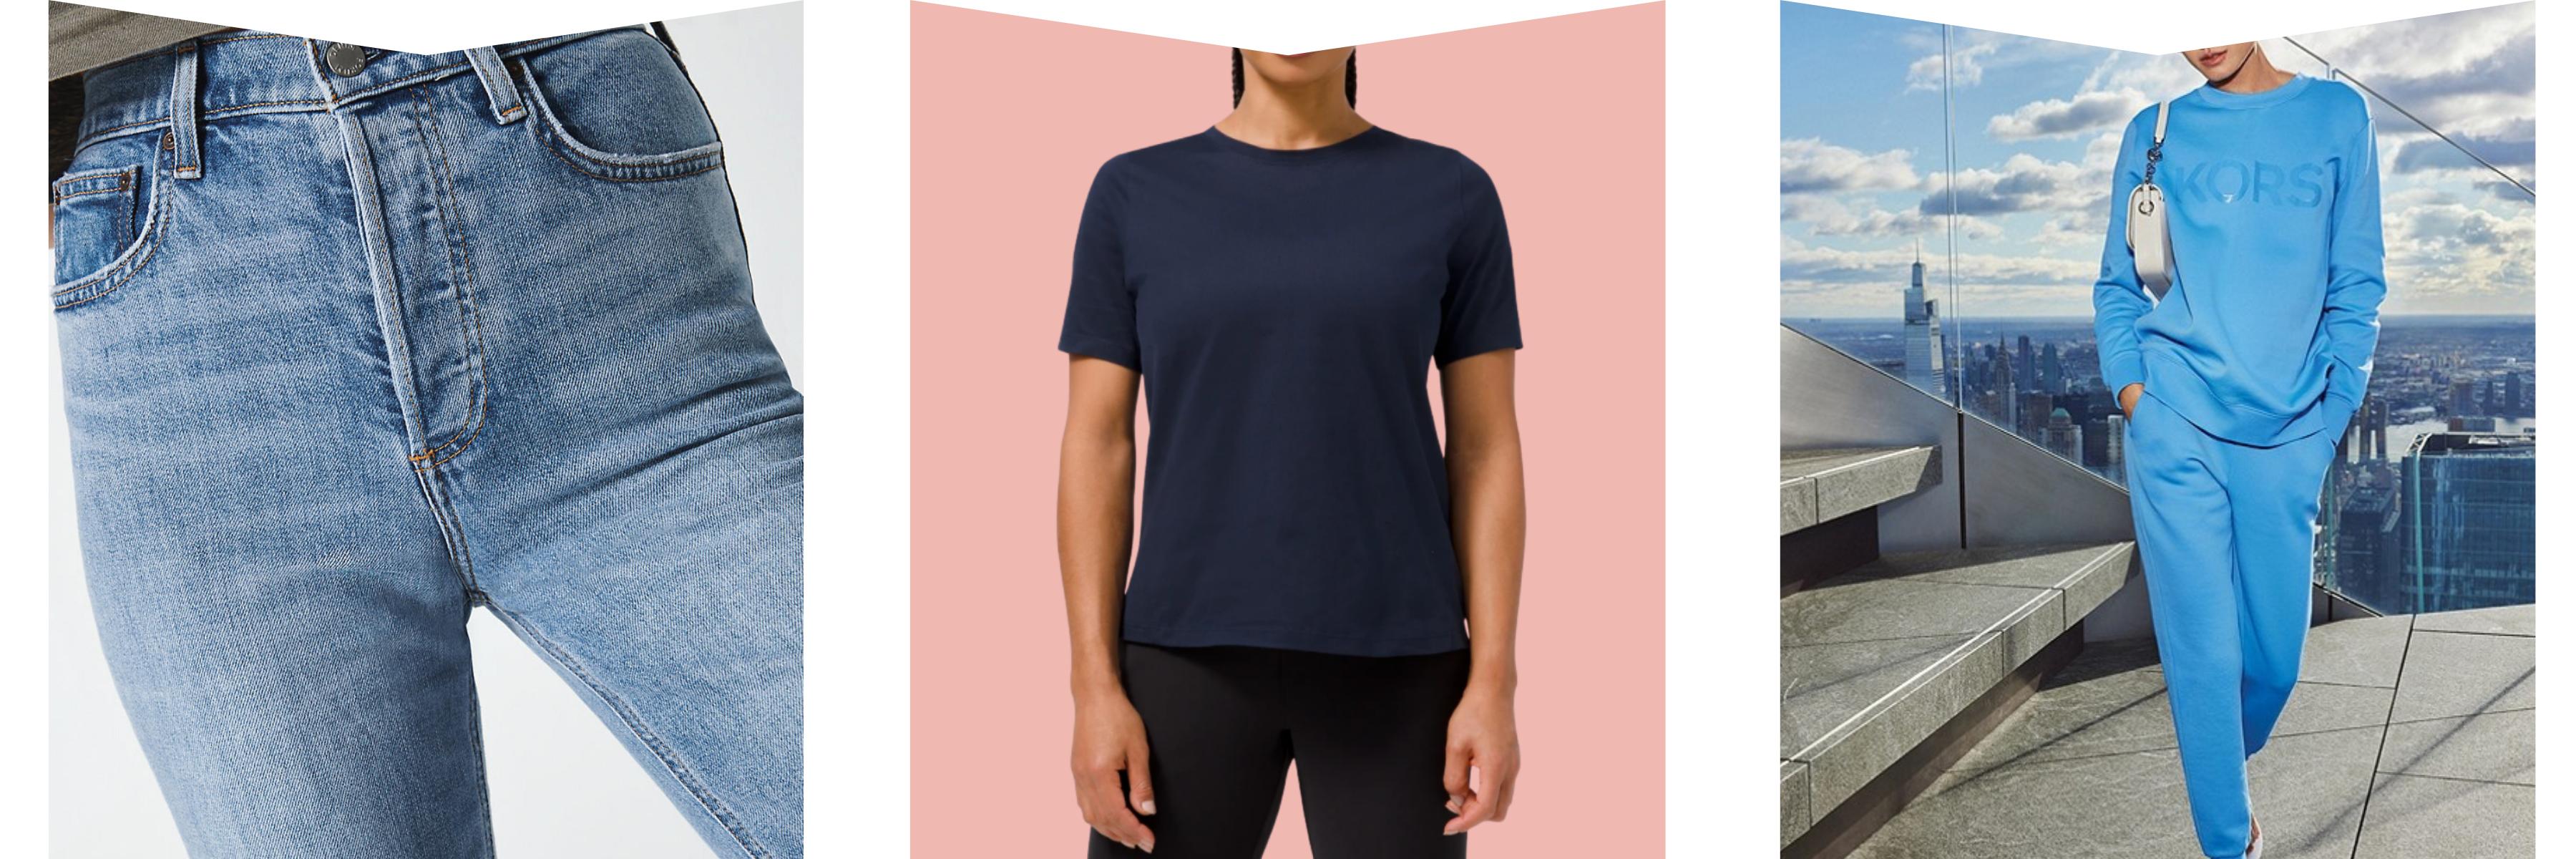 Jeans, organic cotton tee and sweatshirt